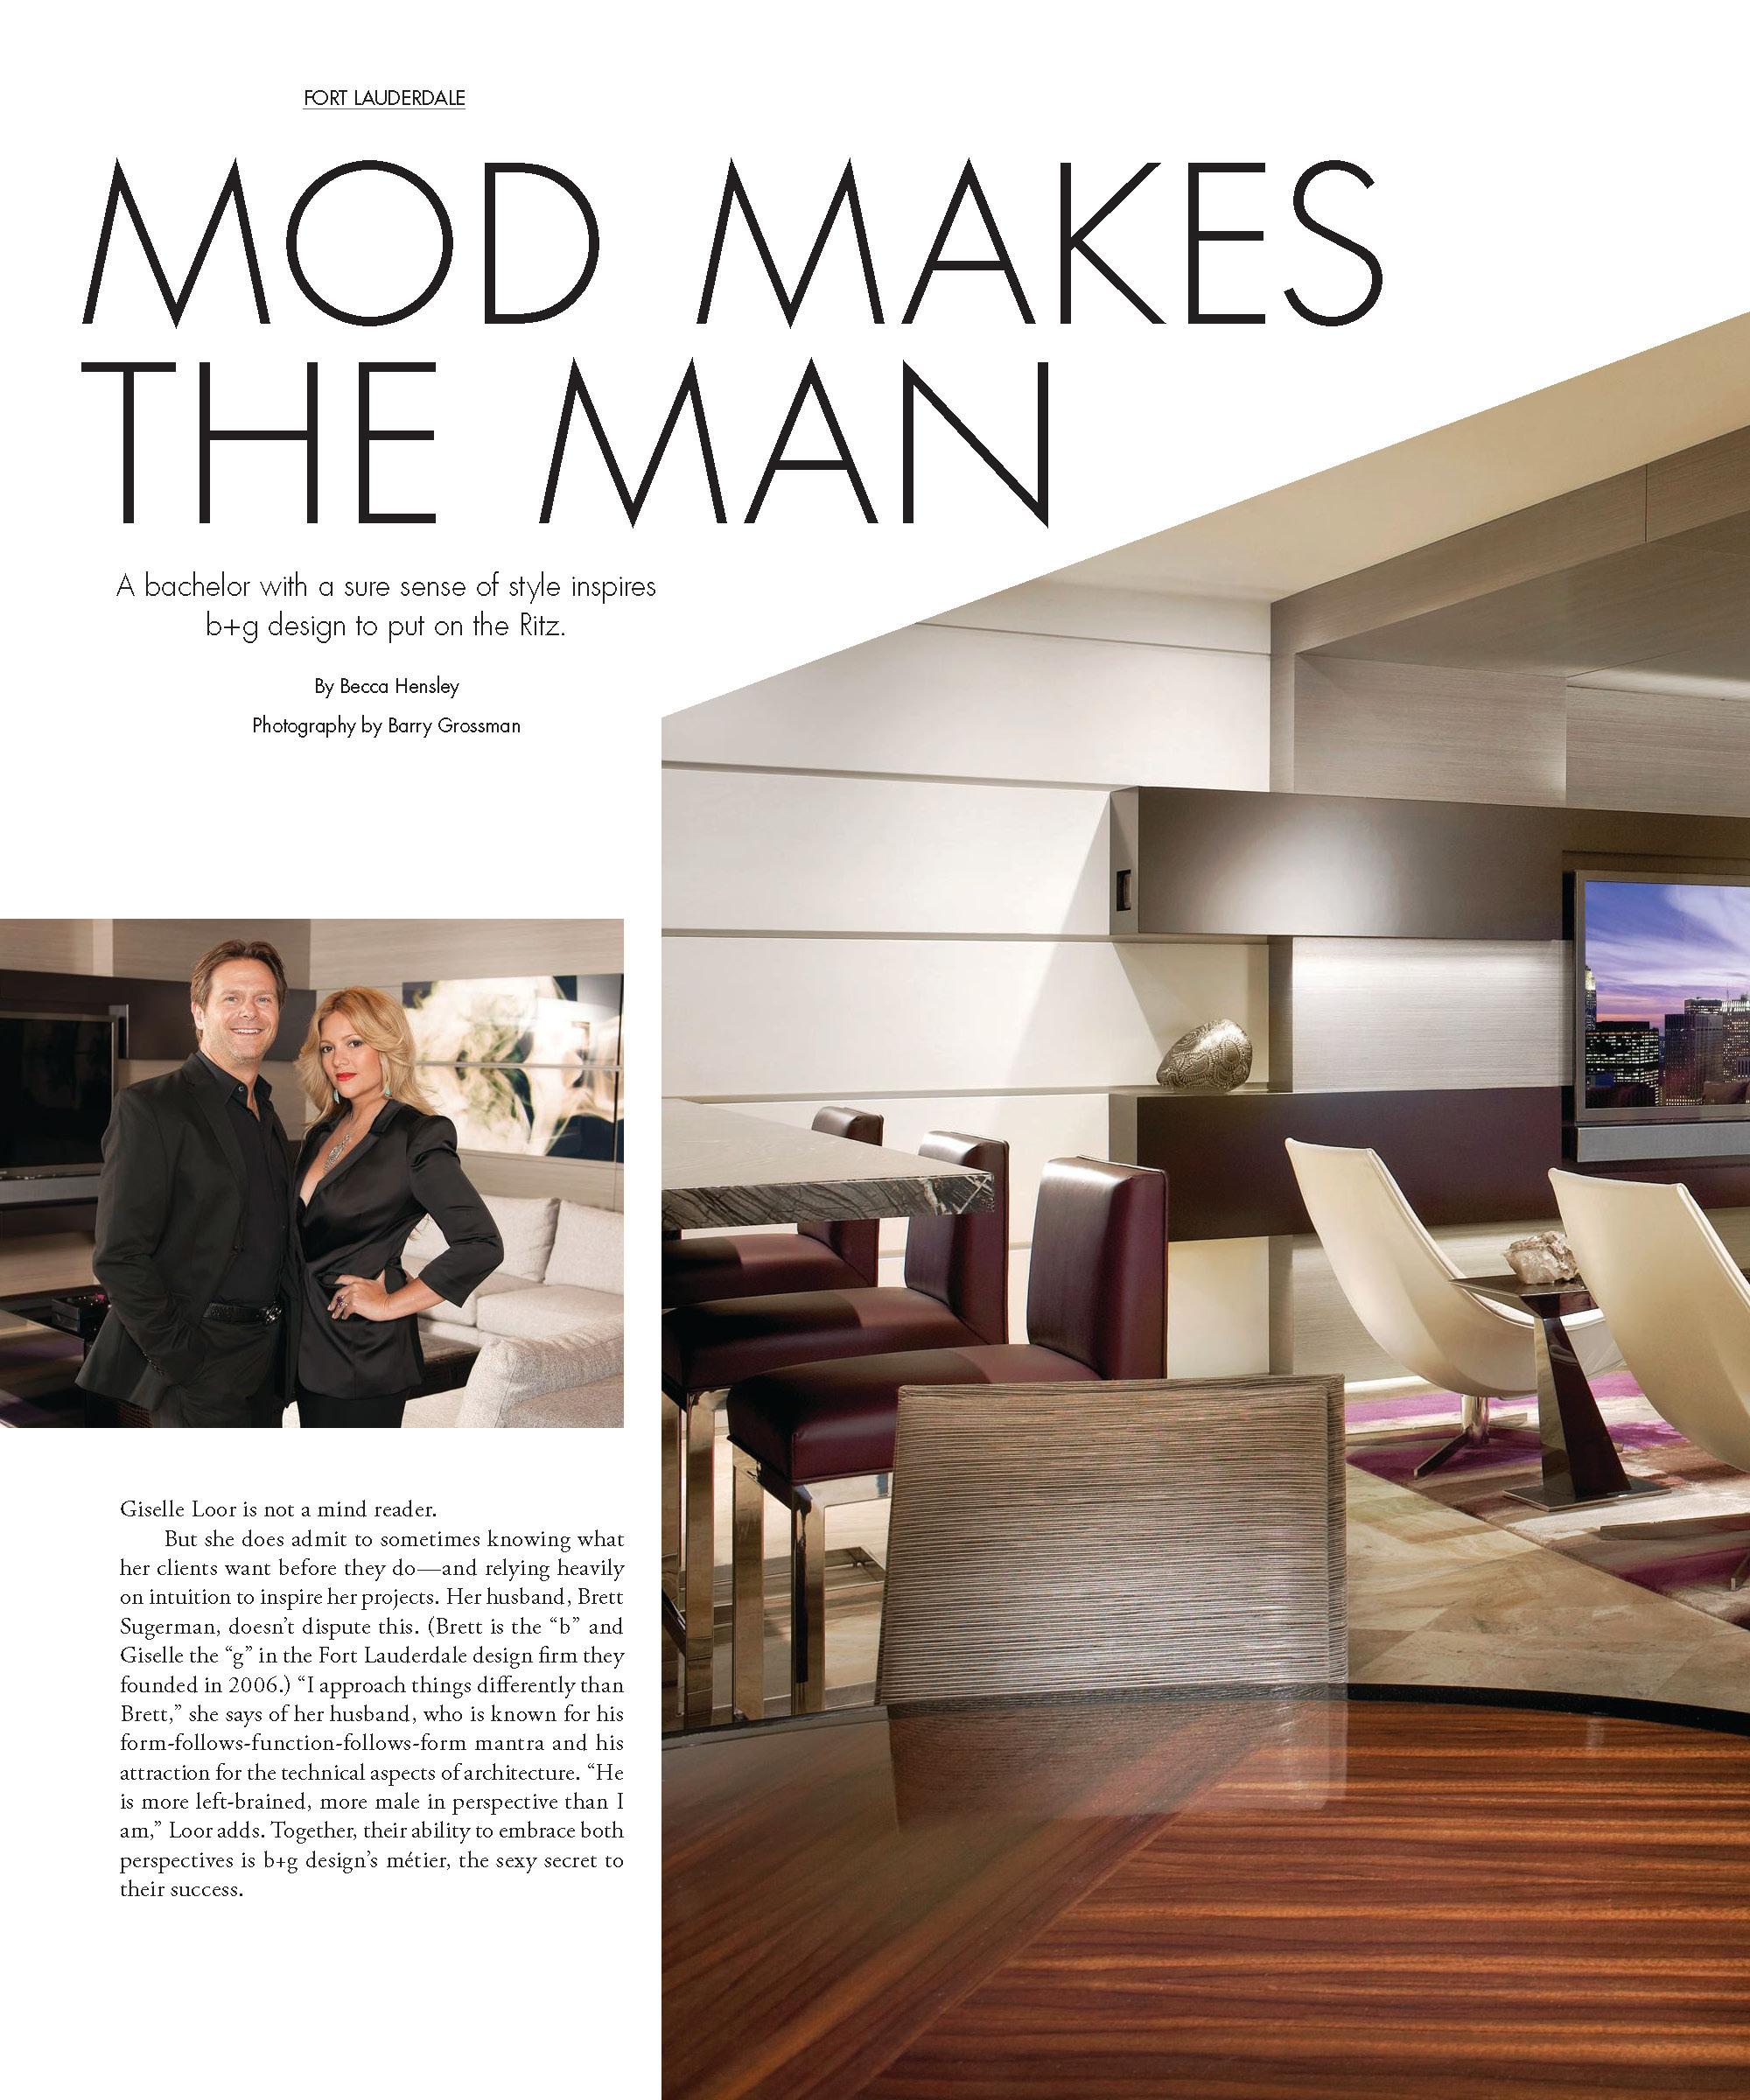 Mod Makes The Man - Ritz_Page_1.jpg